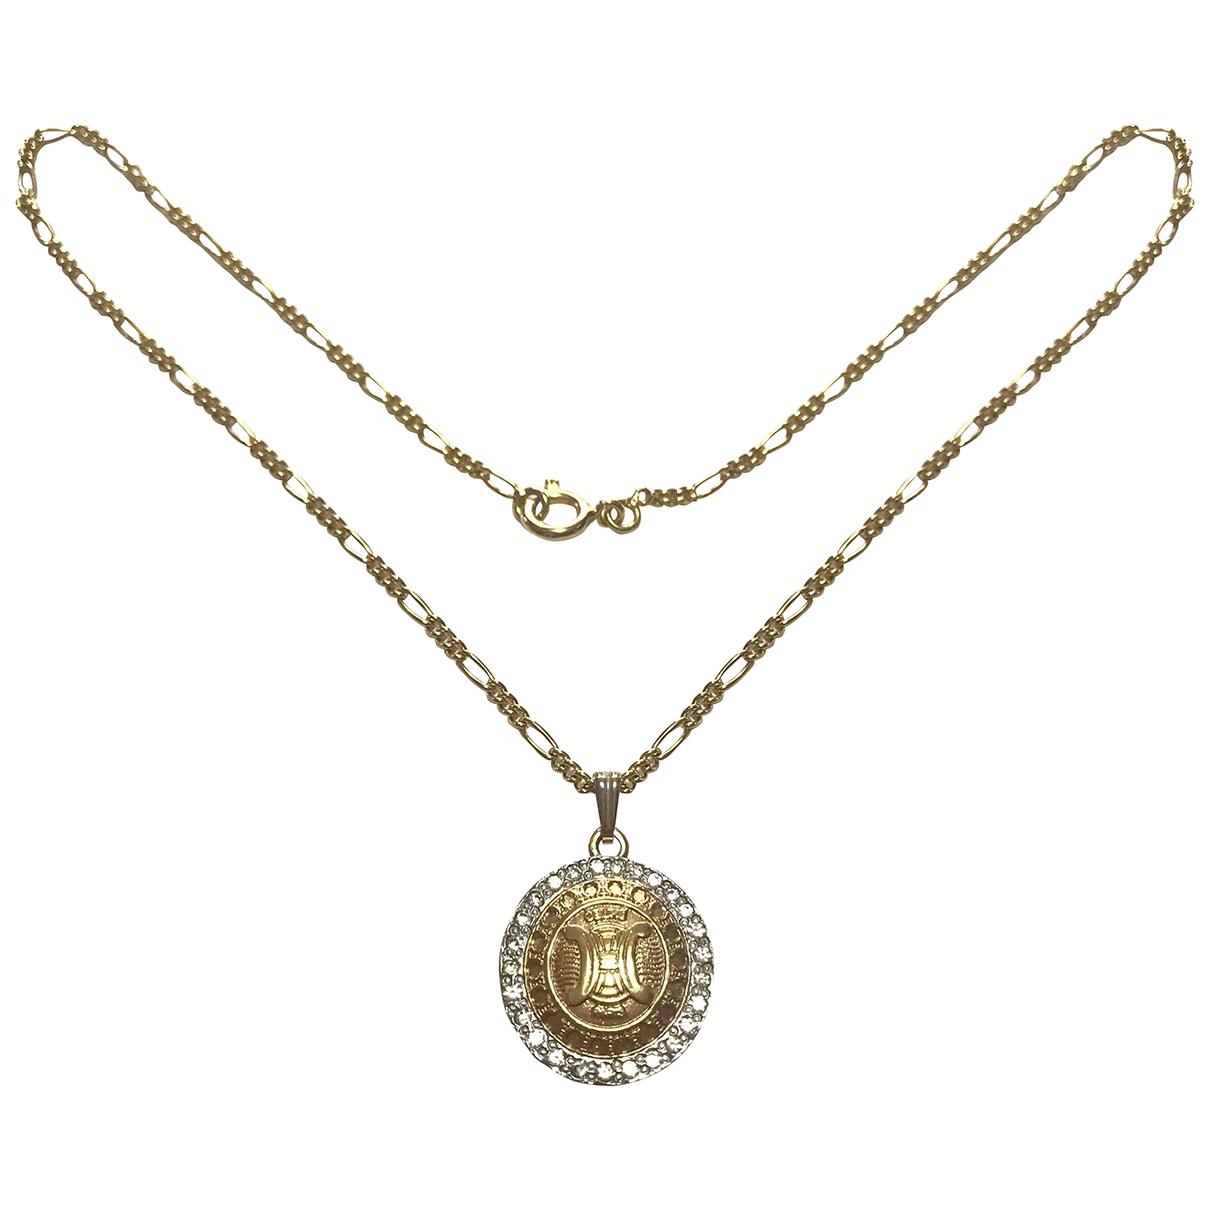 Celine \N Gold Metal necklace for Women \N